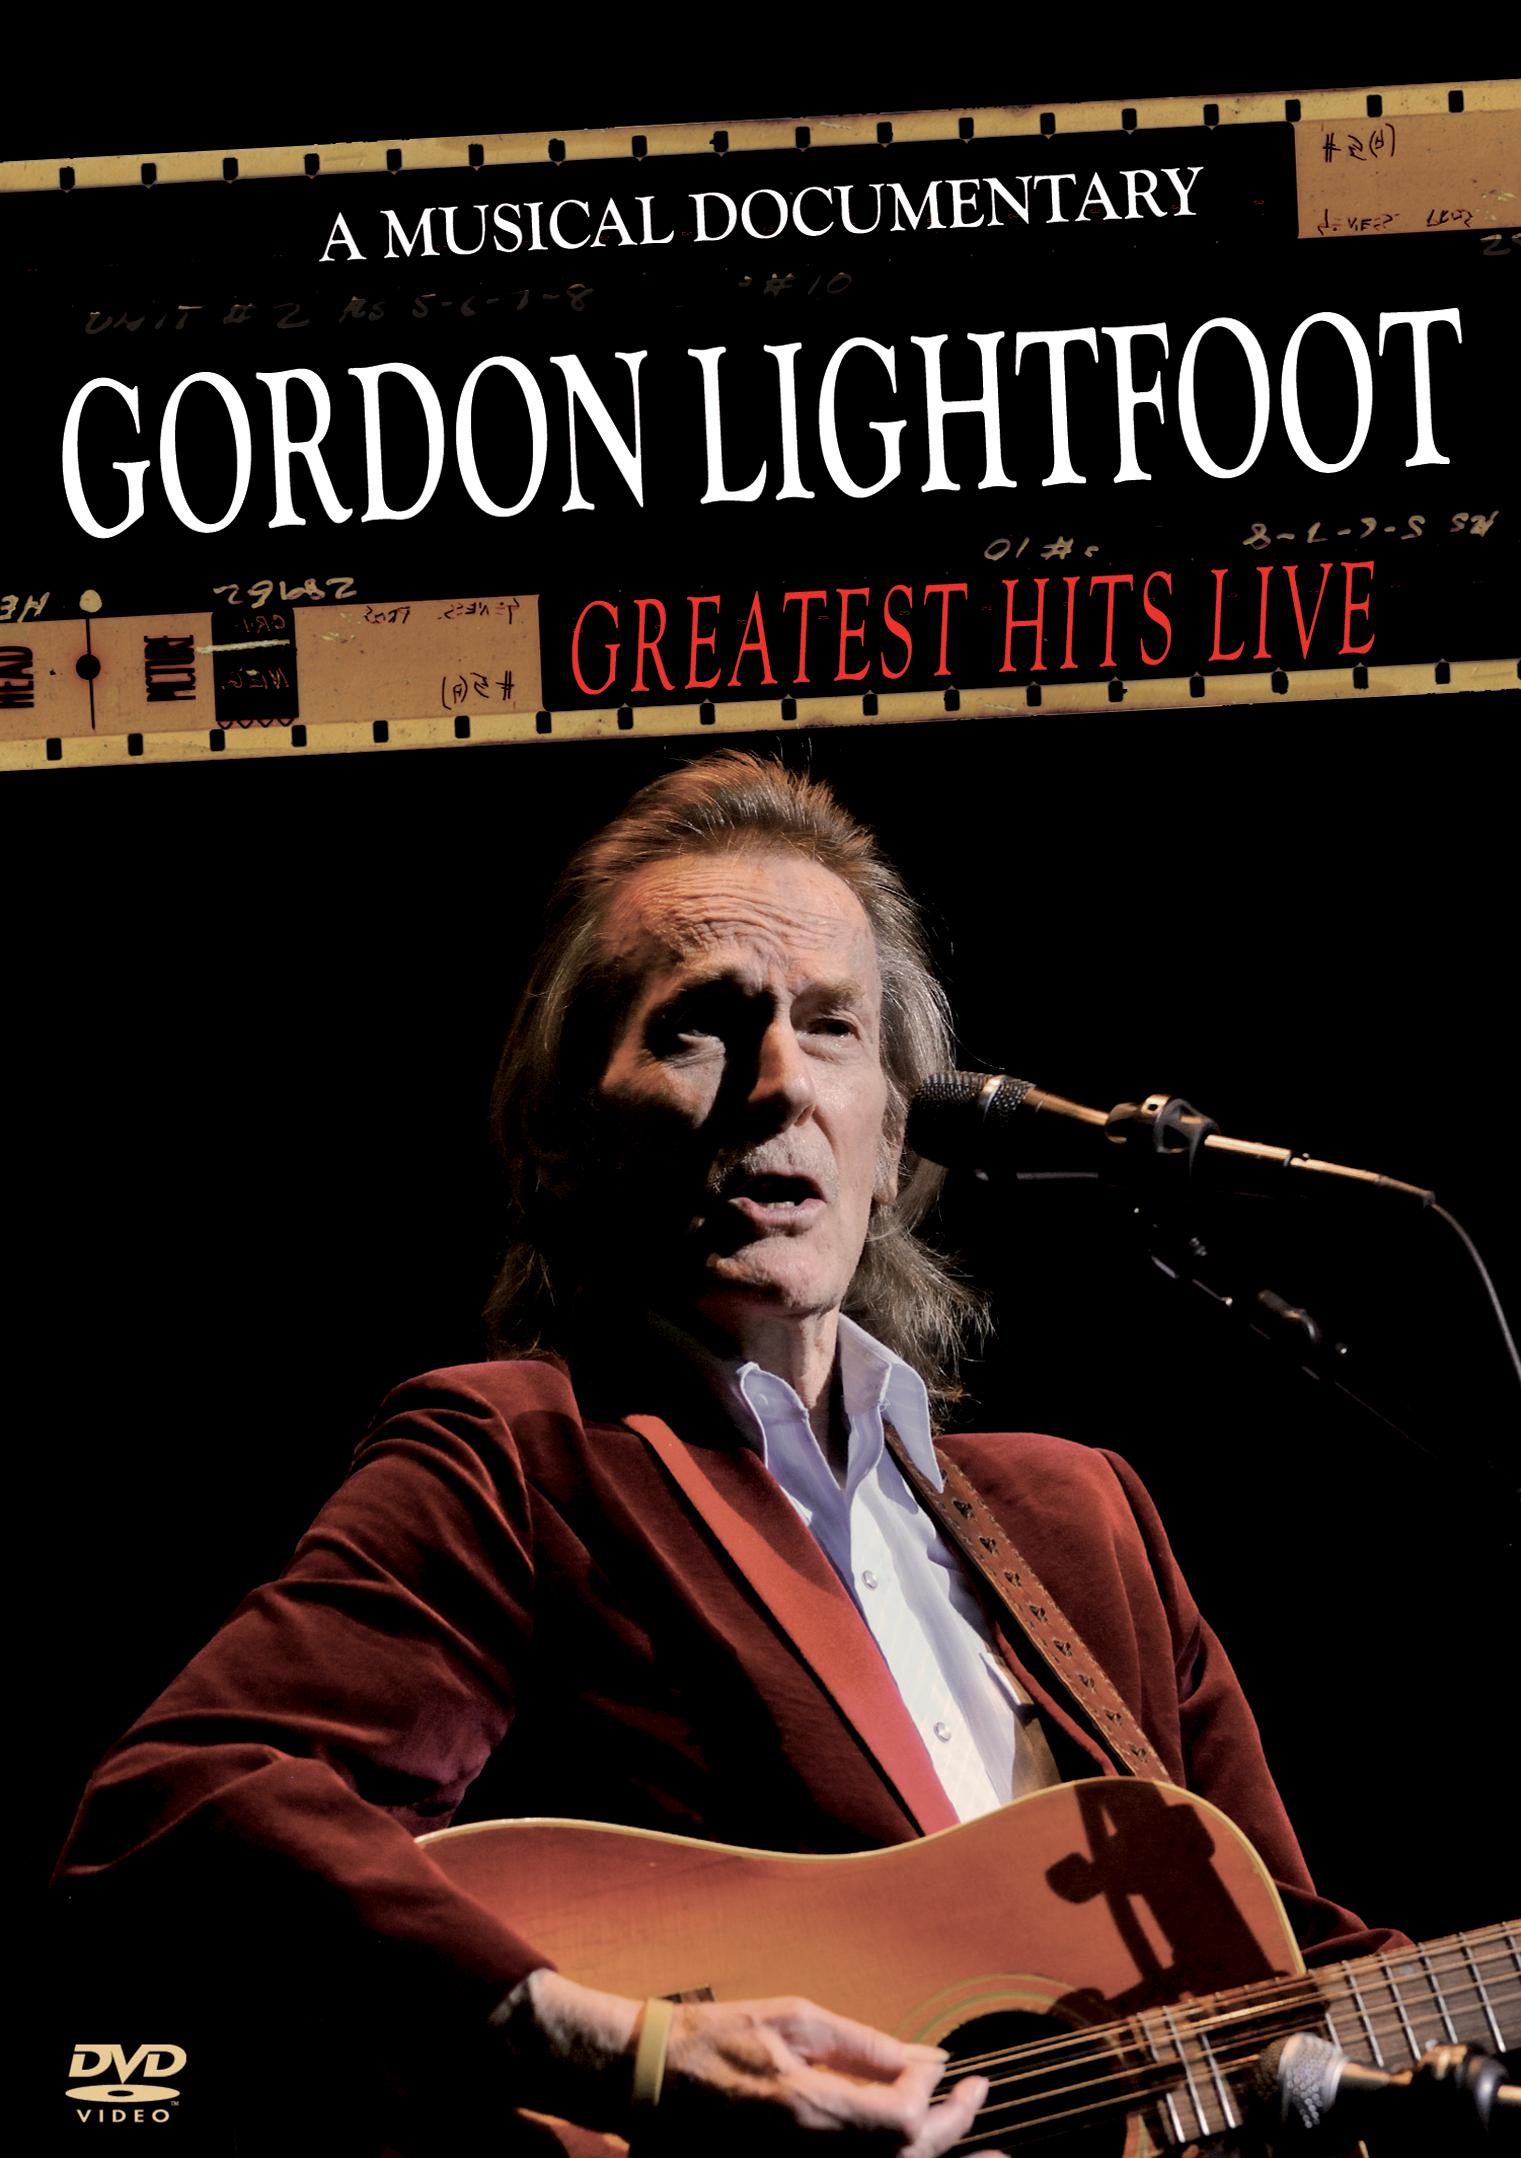 Gordon Lightfoot: Greatest Hits Live